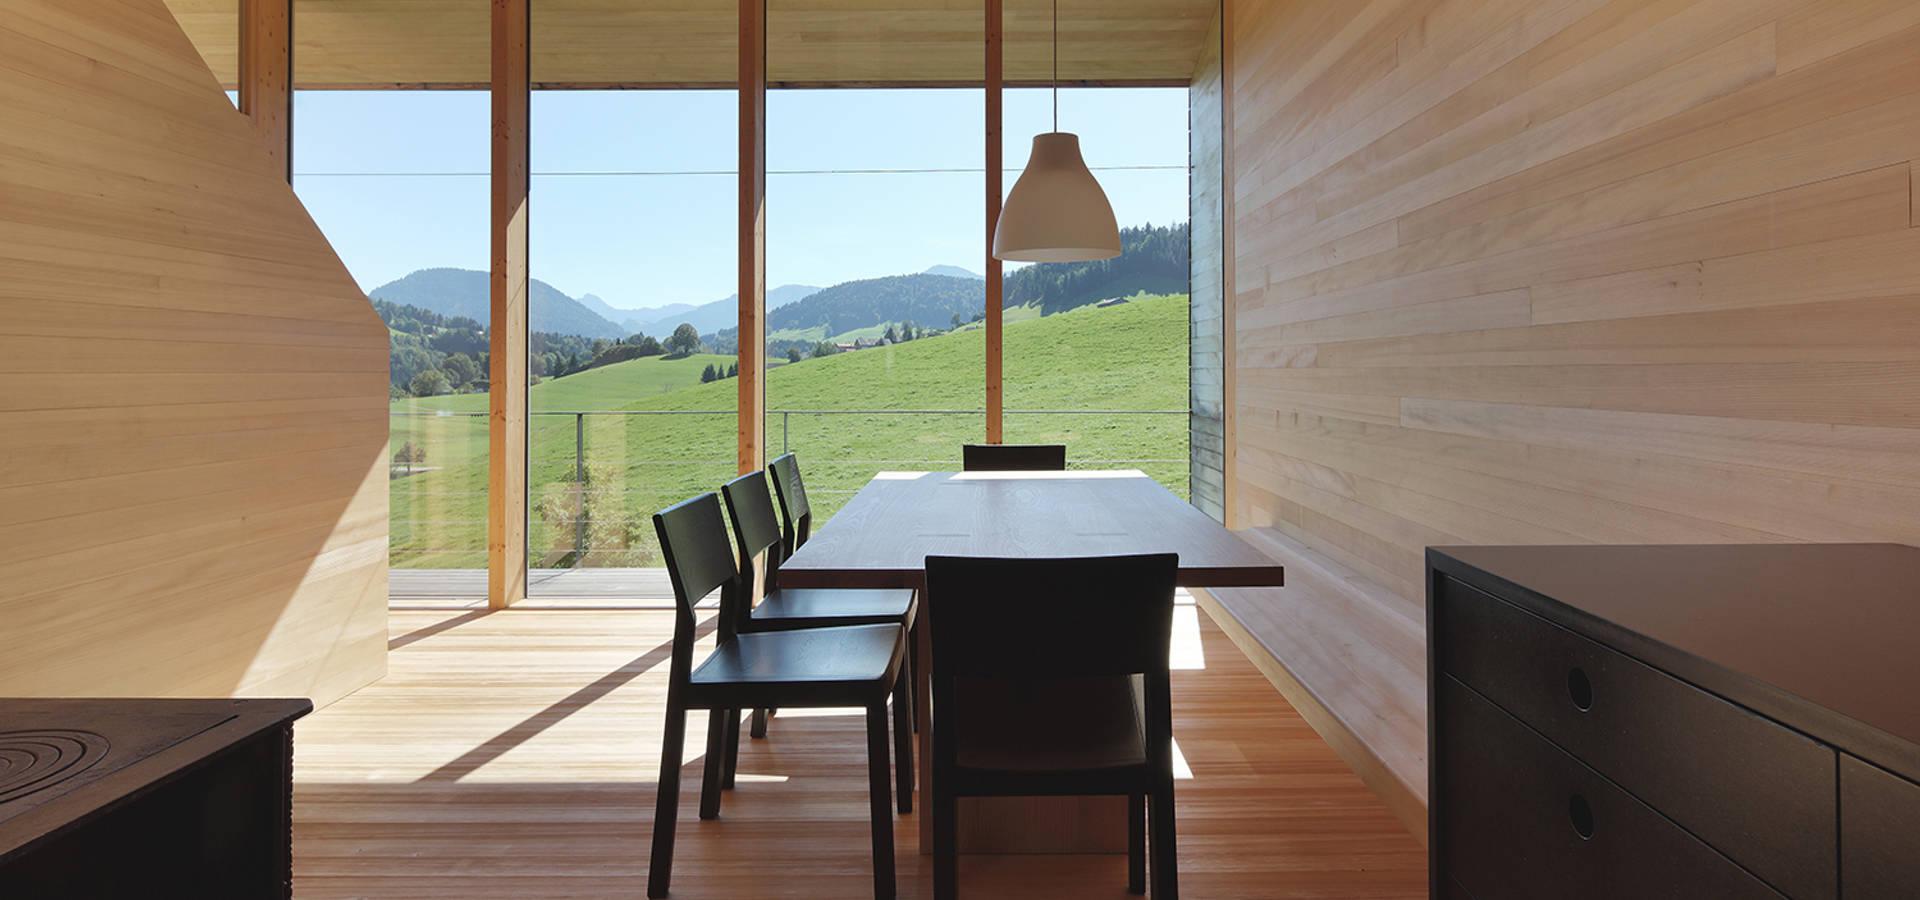 bienenhus ferienhaus in vorarlberg by yonder. Black Bedroom Furniture Sets. Home Design Ideas